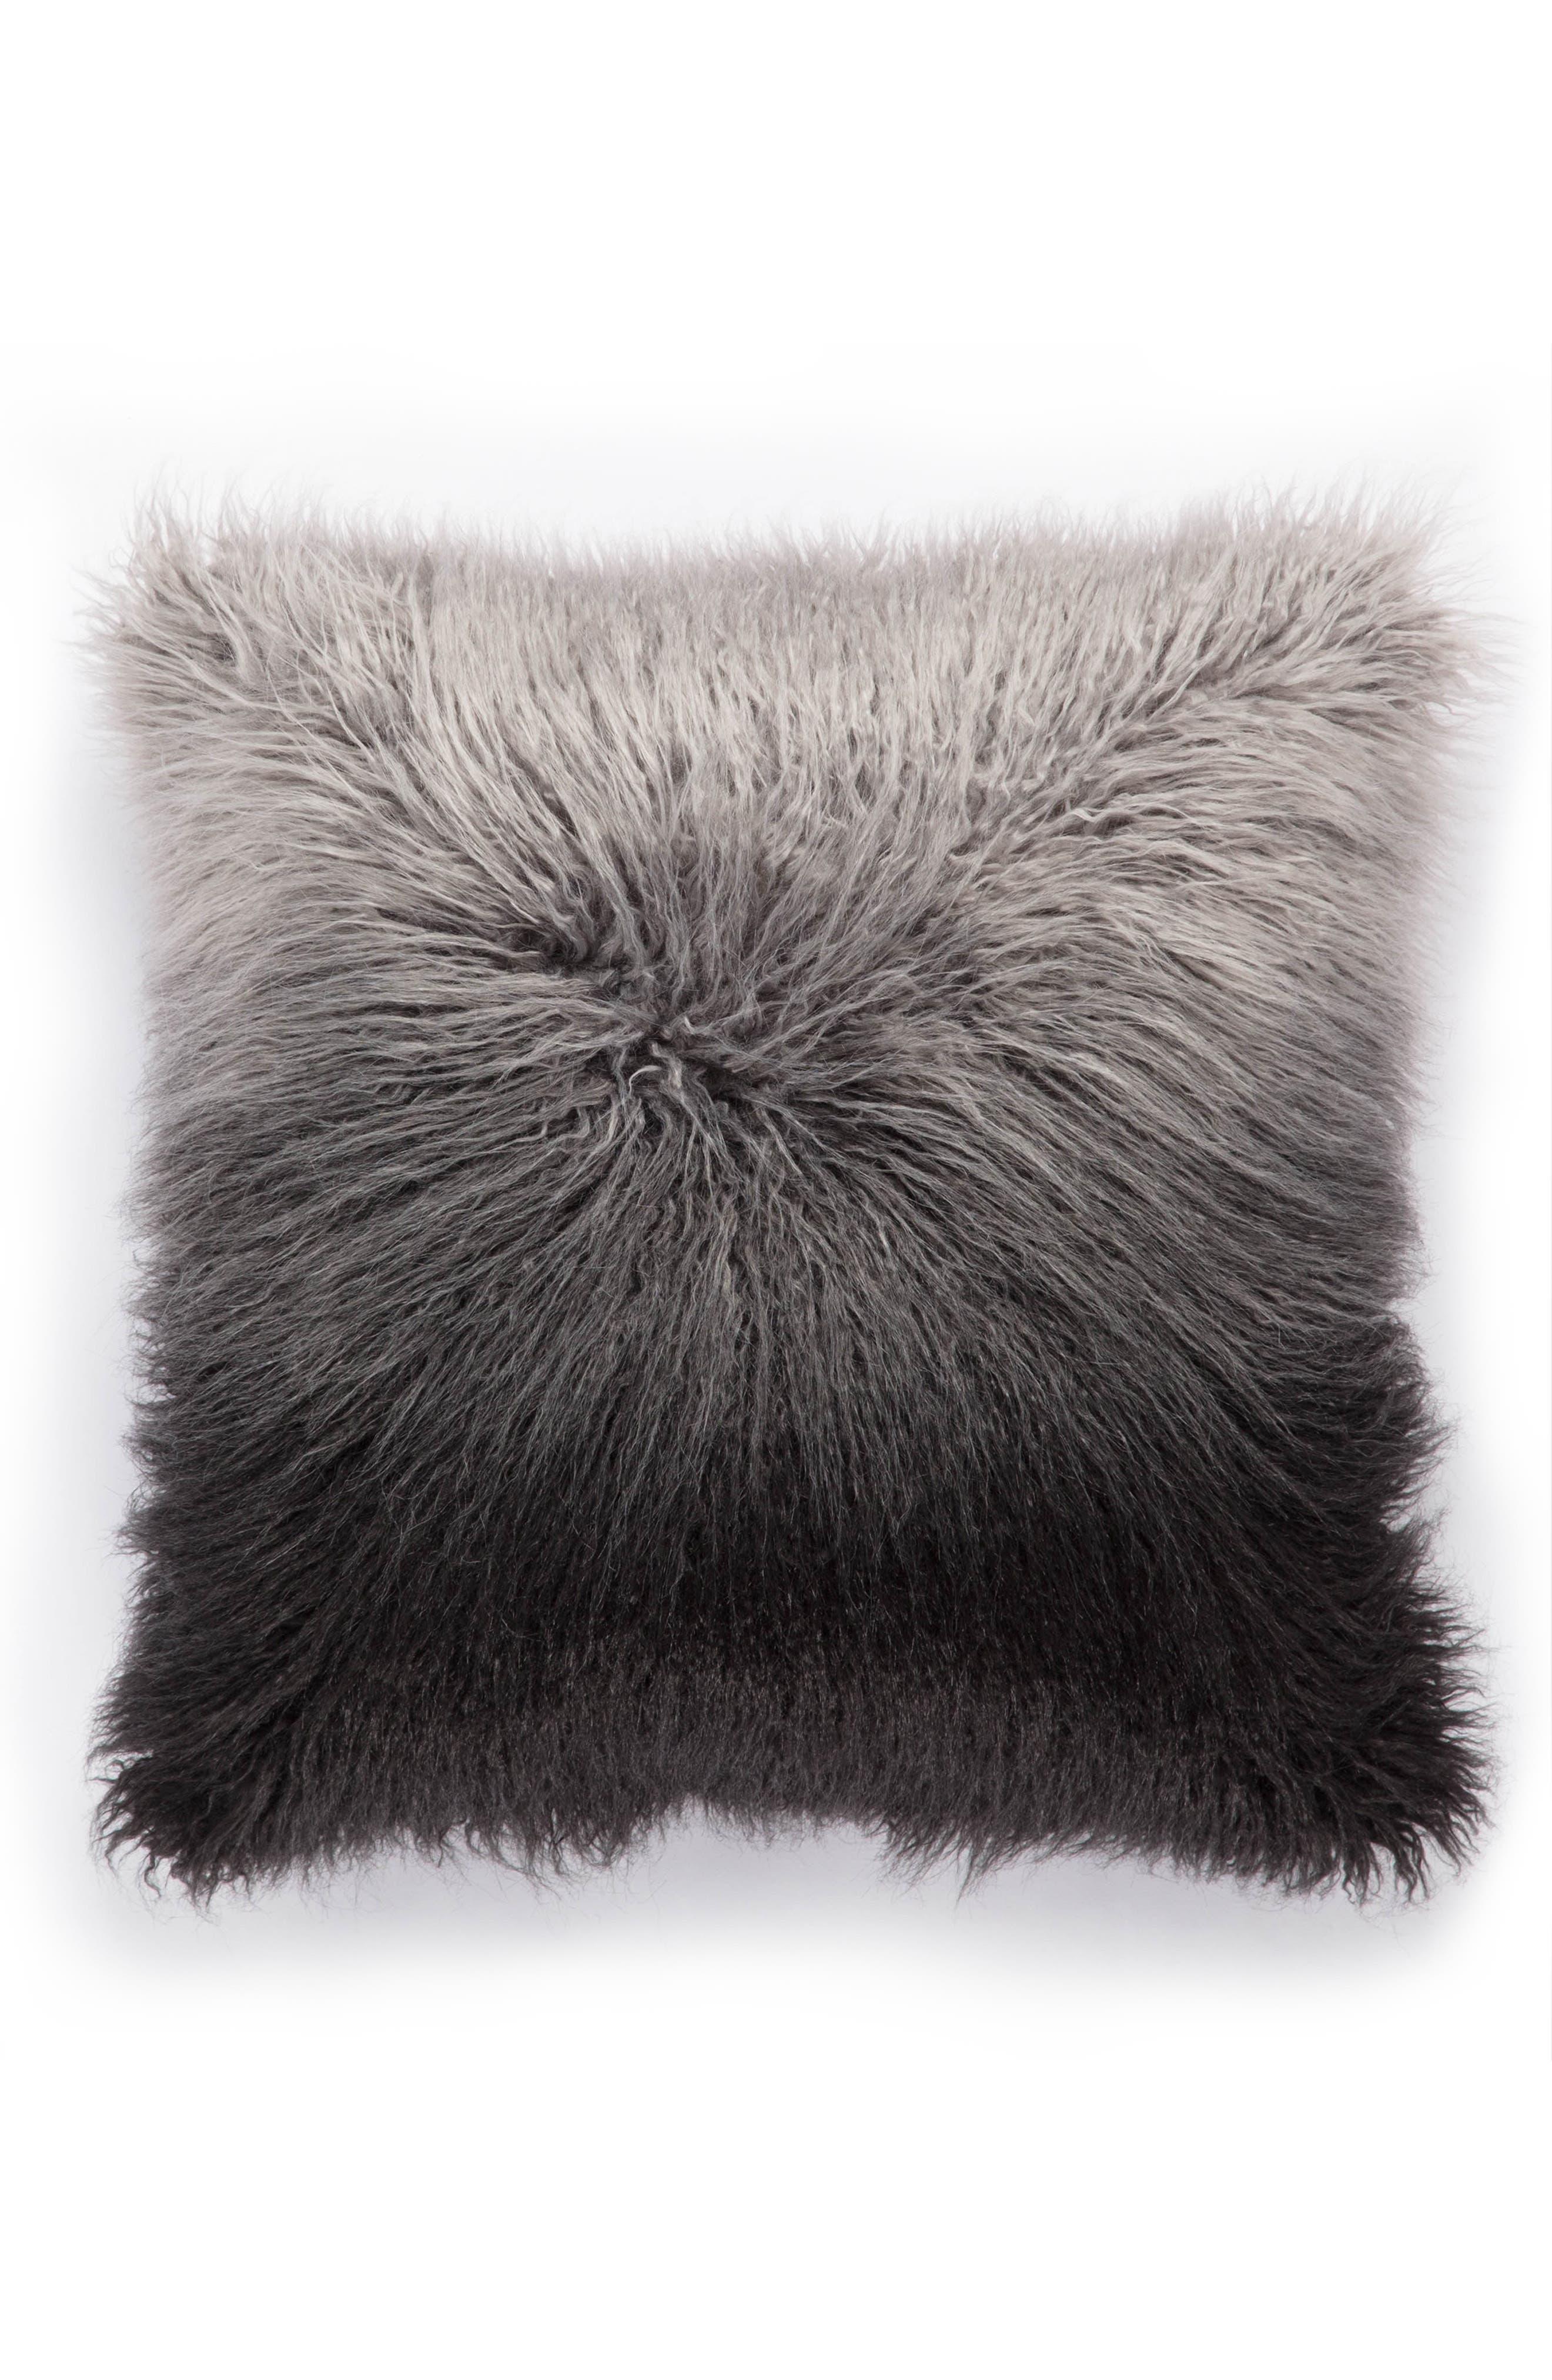 Alternate Image 1 Selected - Jaipur Mahal Faux Fur Accent Pillow